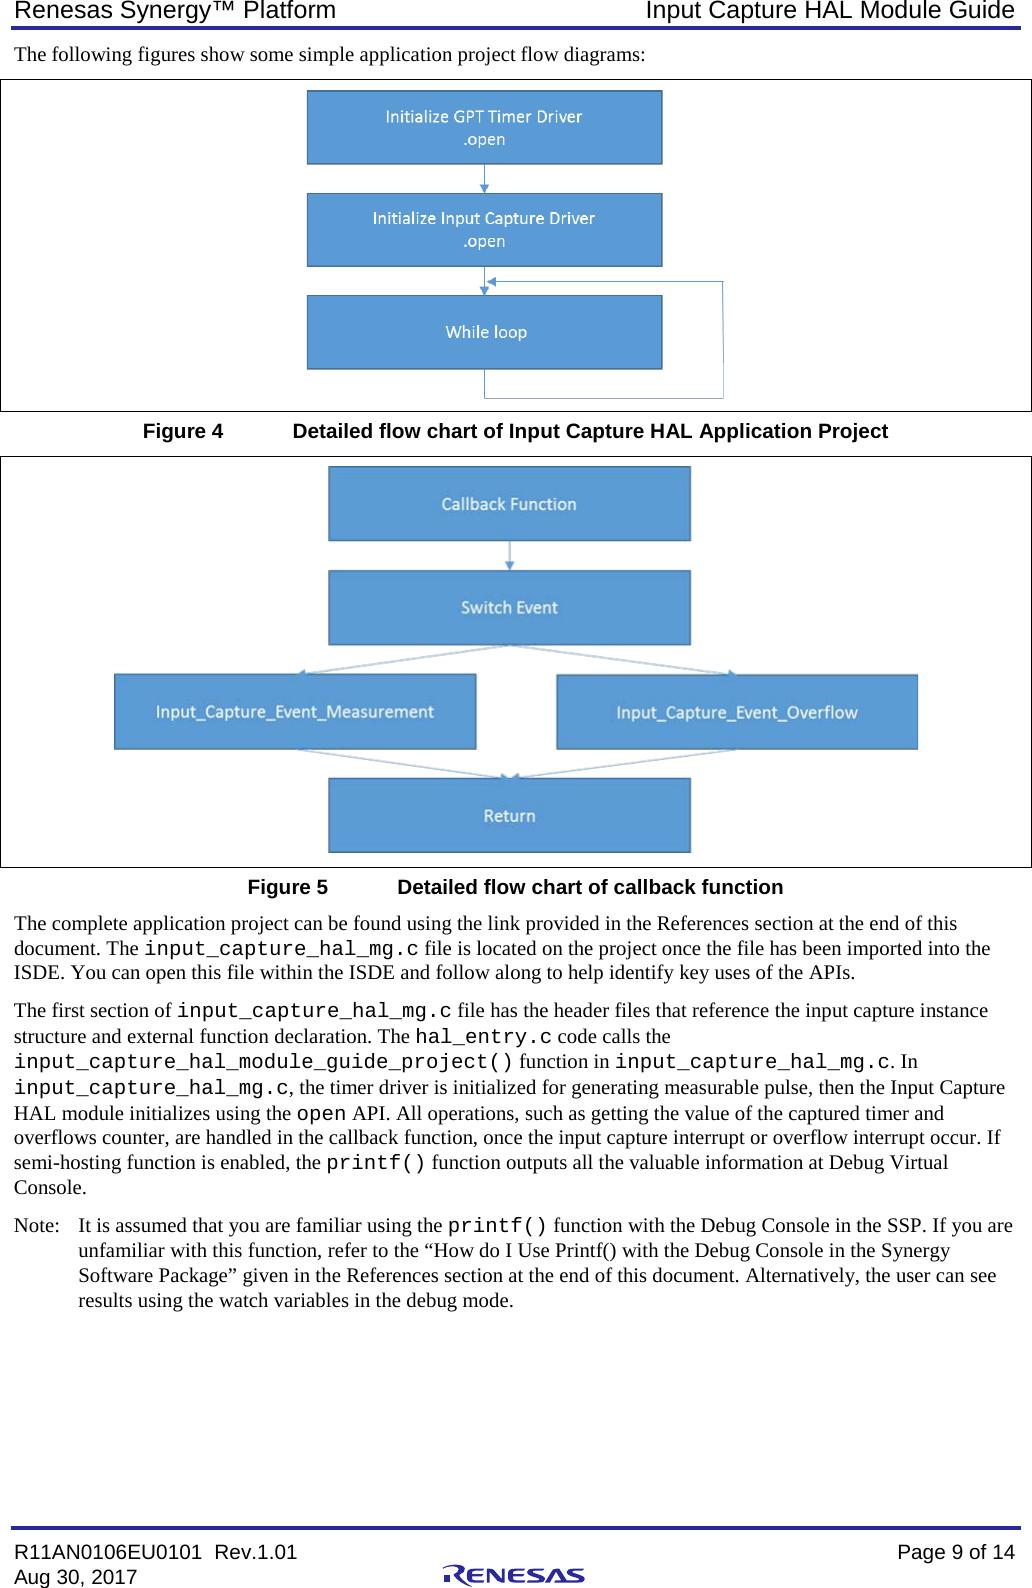 Input Capture HAL Module Guide Application Project